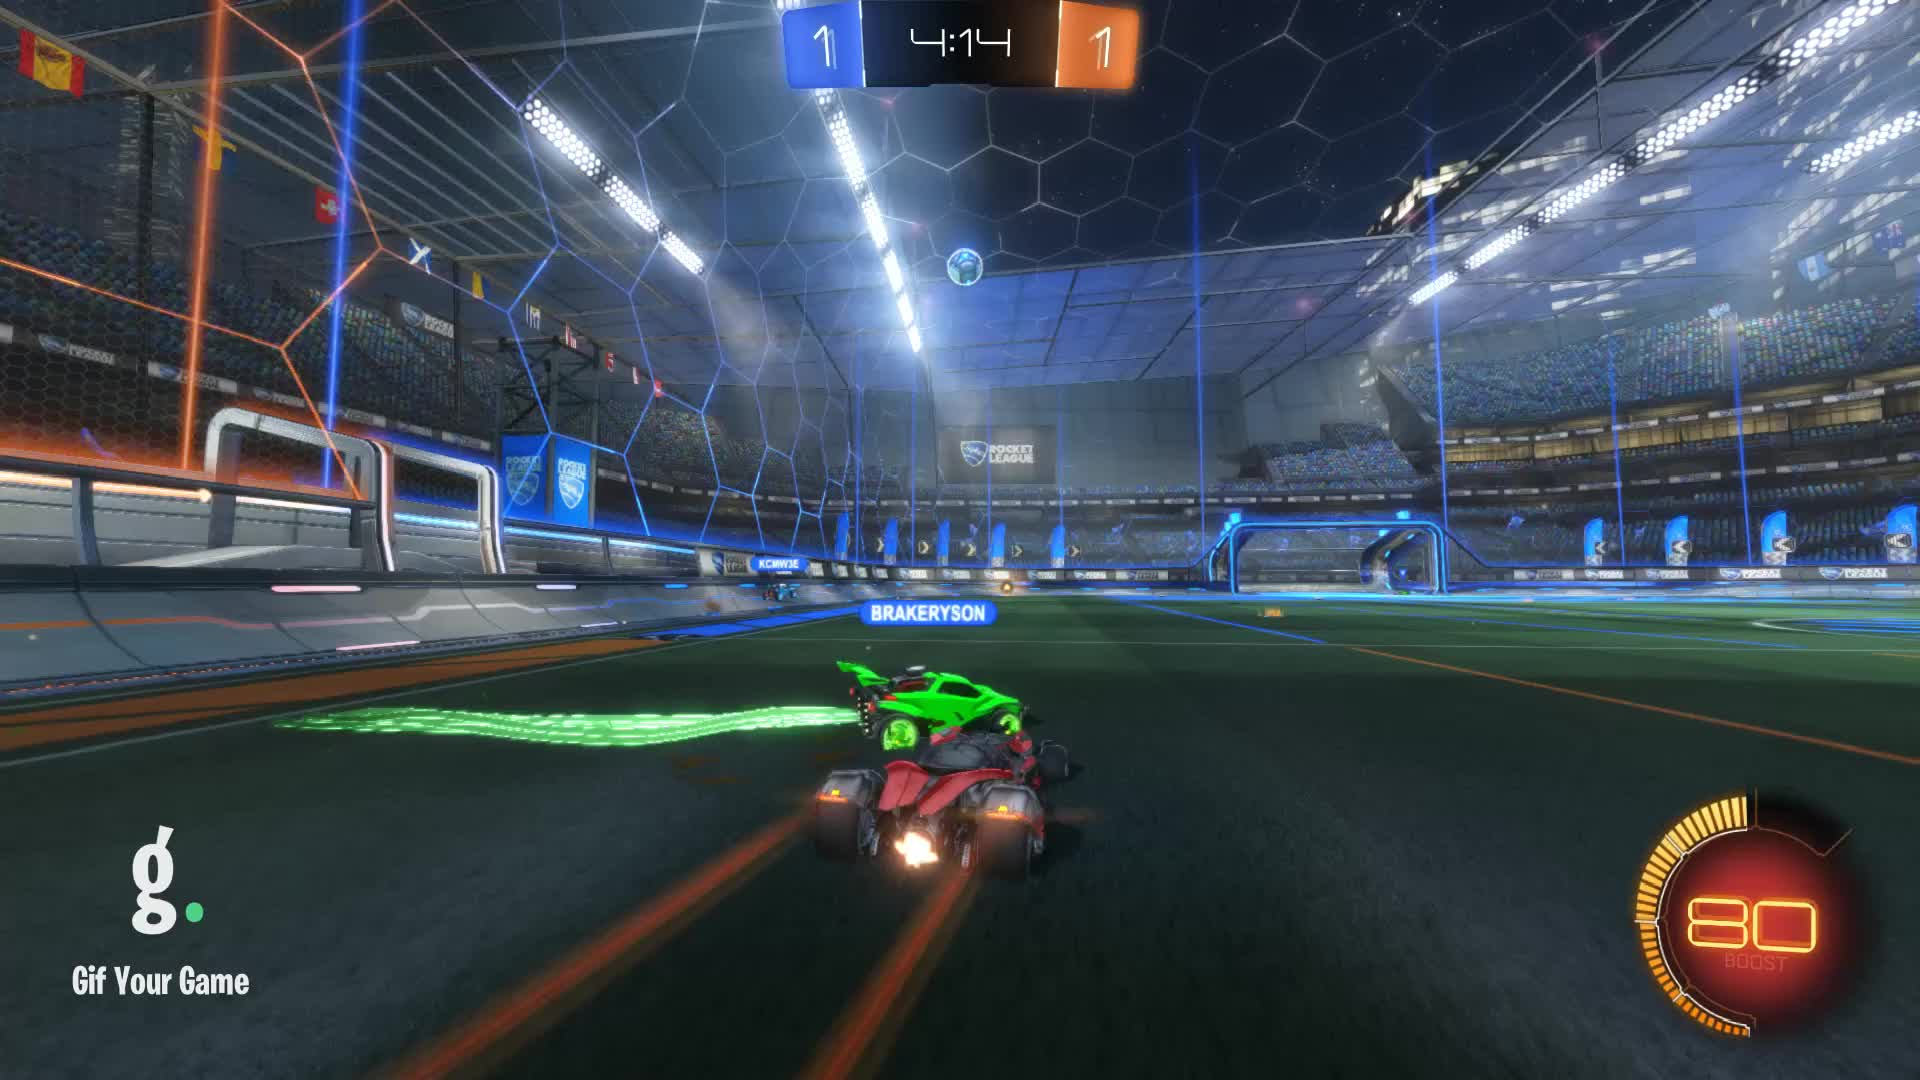 Gif Your Game, GifYourGame, Goal, Rocket League, RocketLeague, colesolo, Goal 3: colesolo GIFs